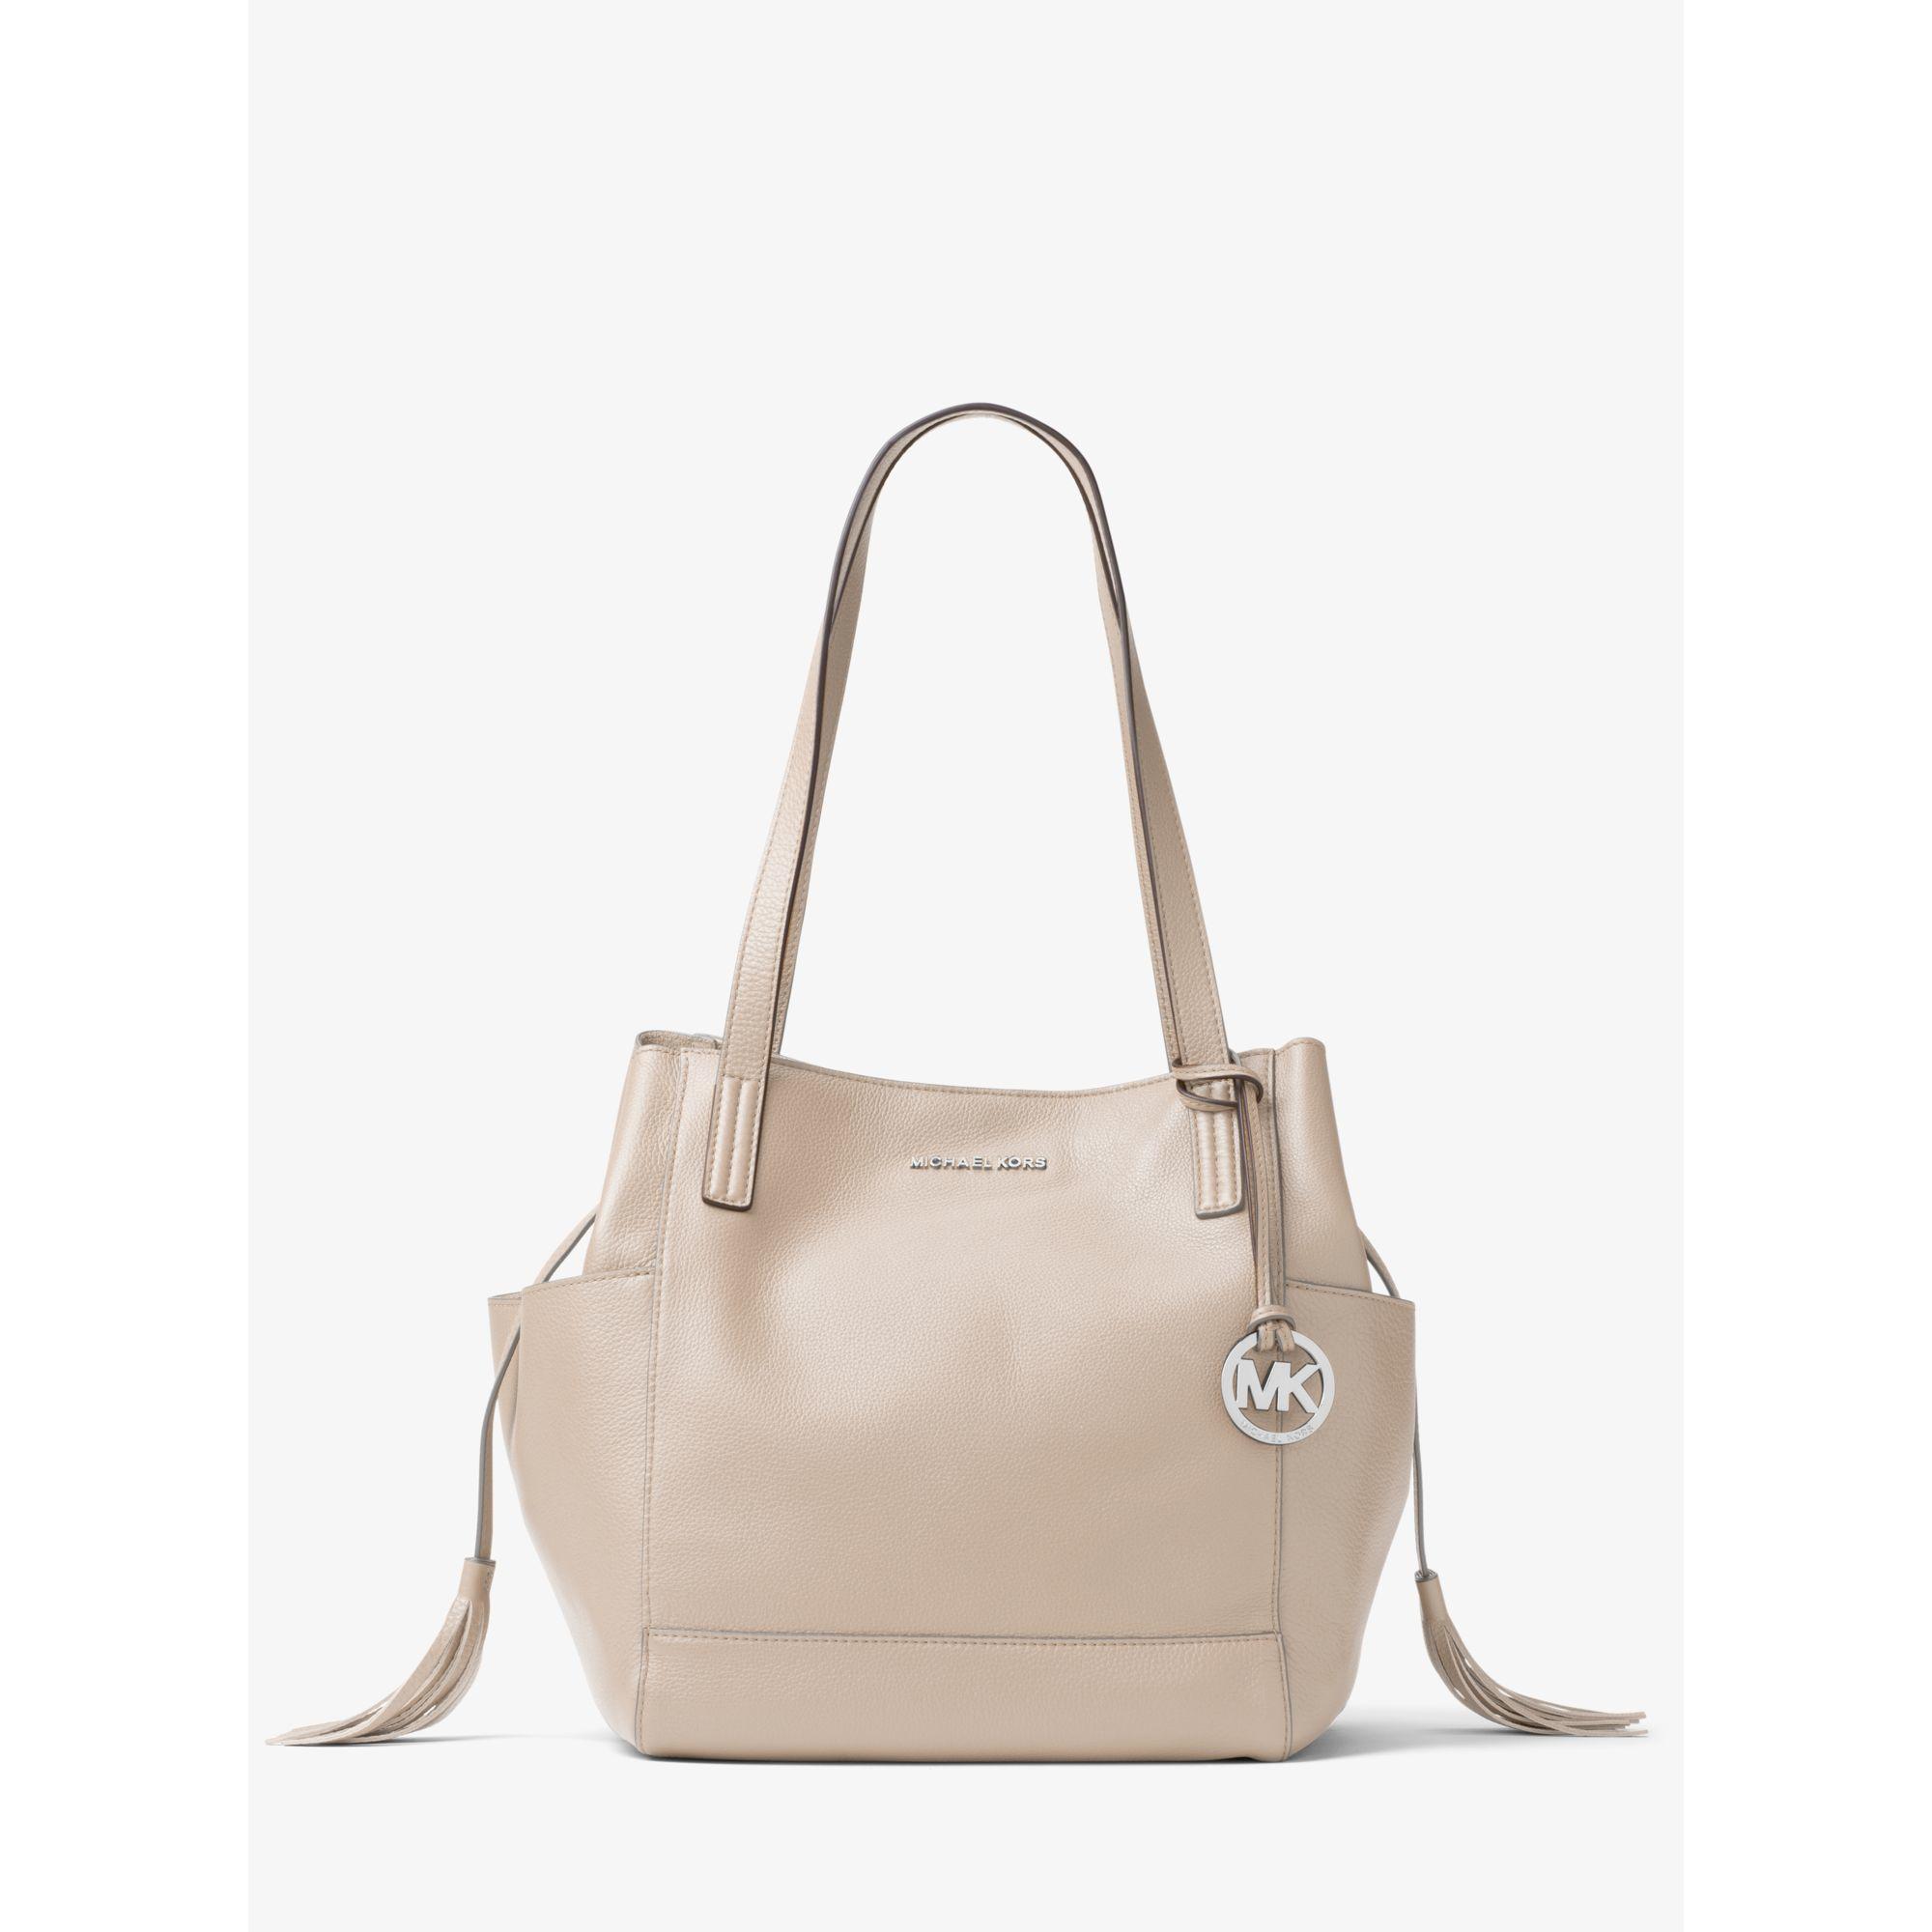 0cda1de286 Lyst - Michael Kors Ashbury Large Leather Shoulder Bag